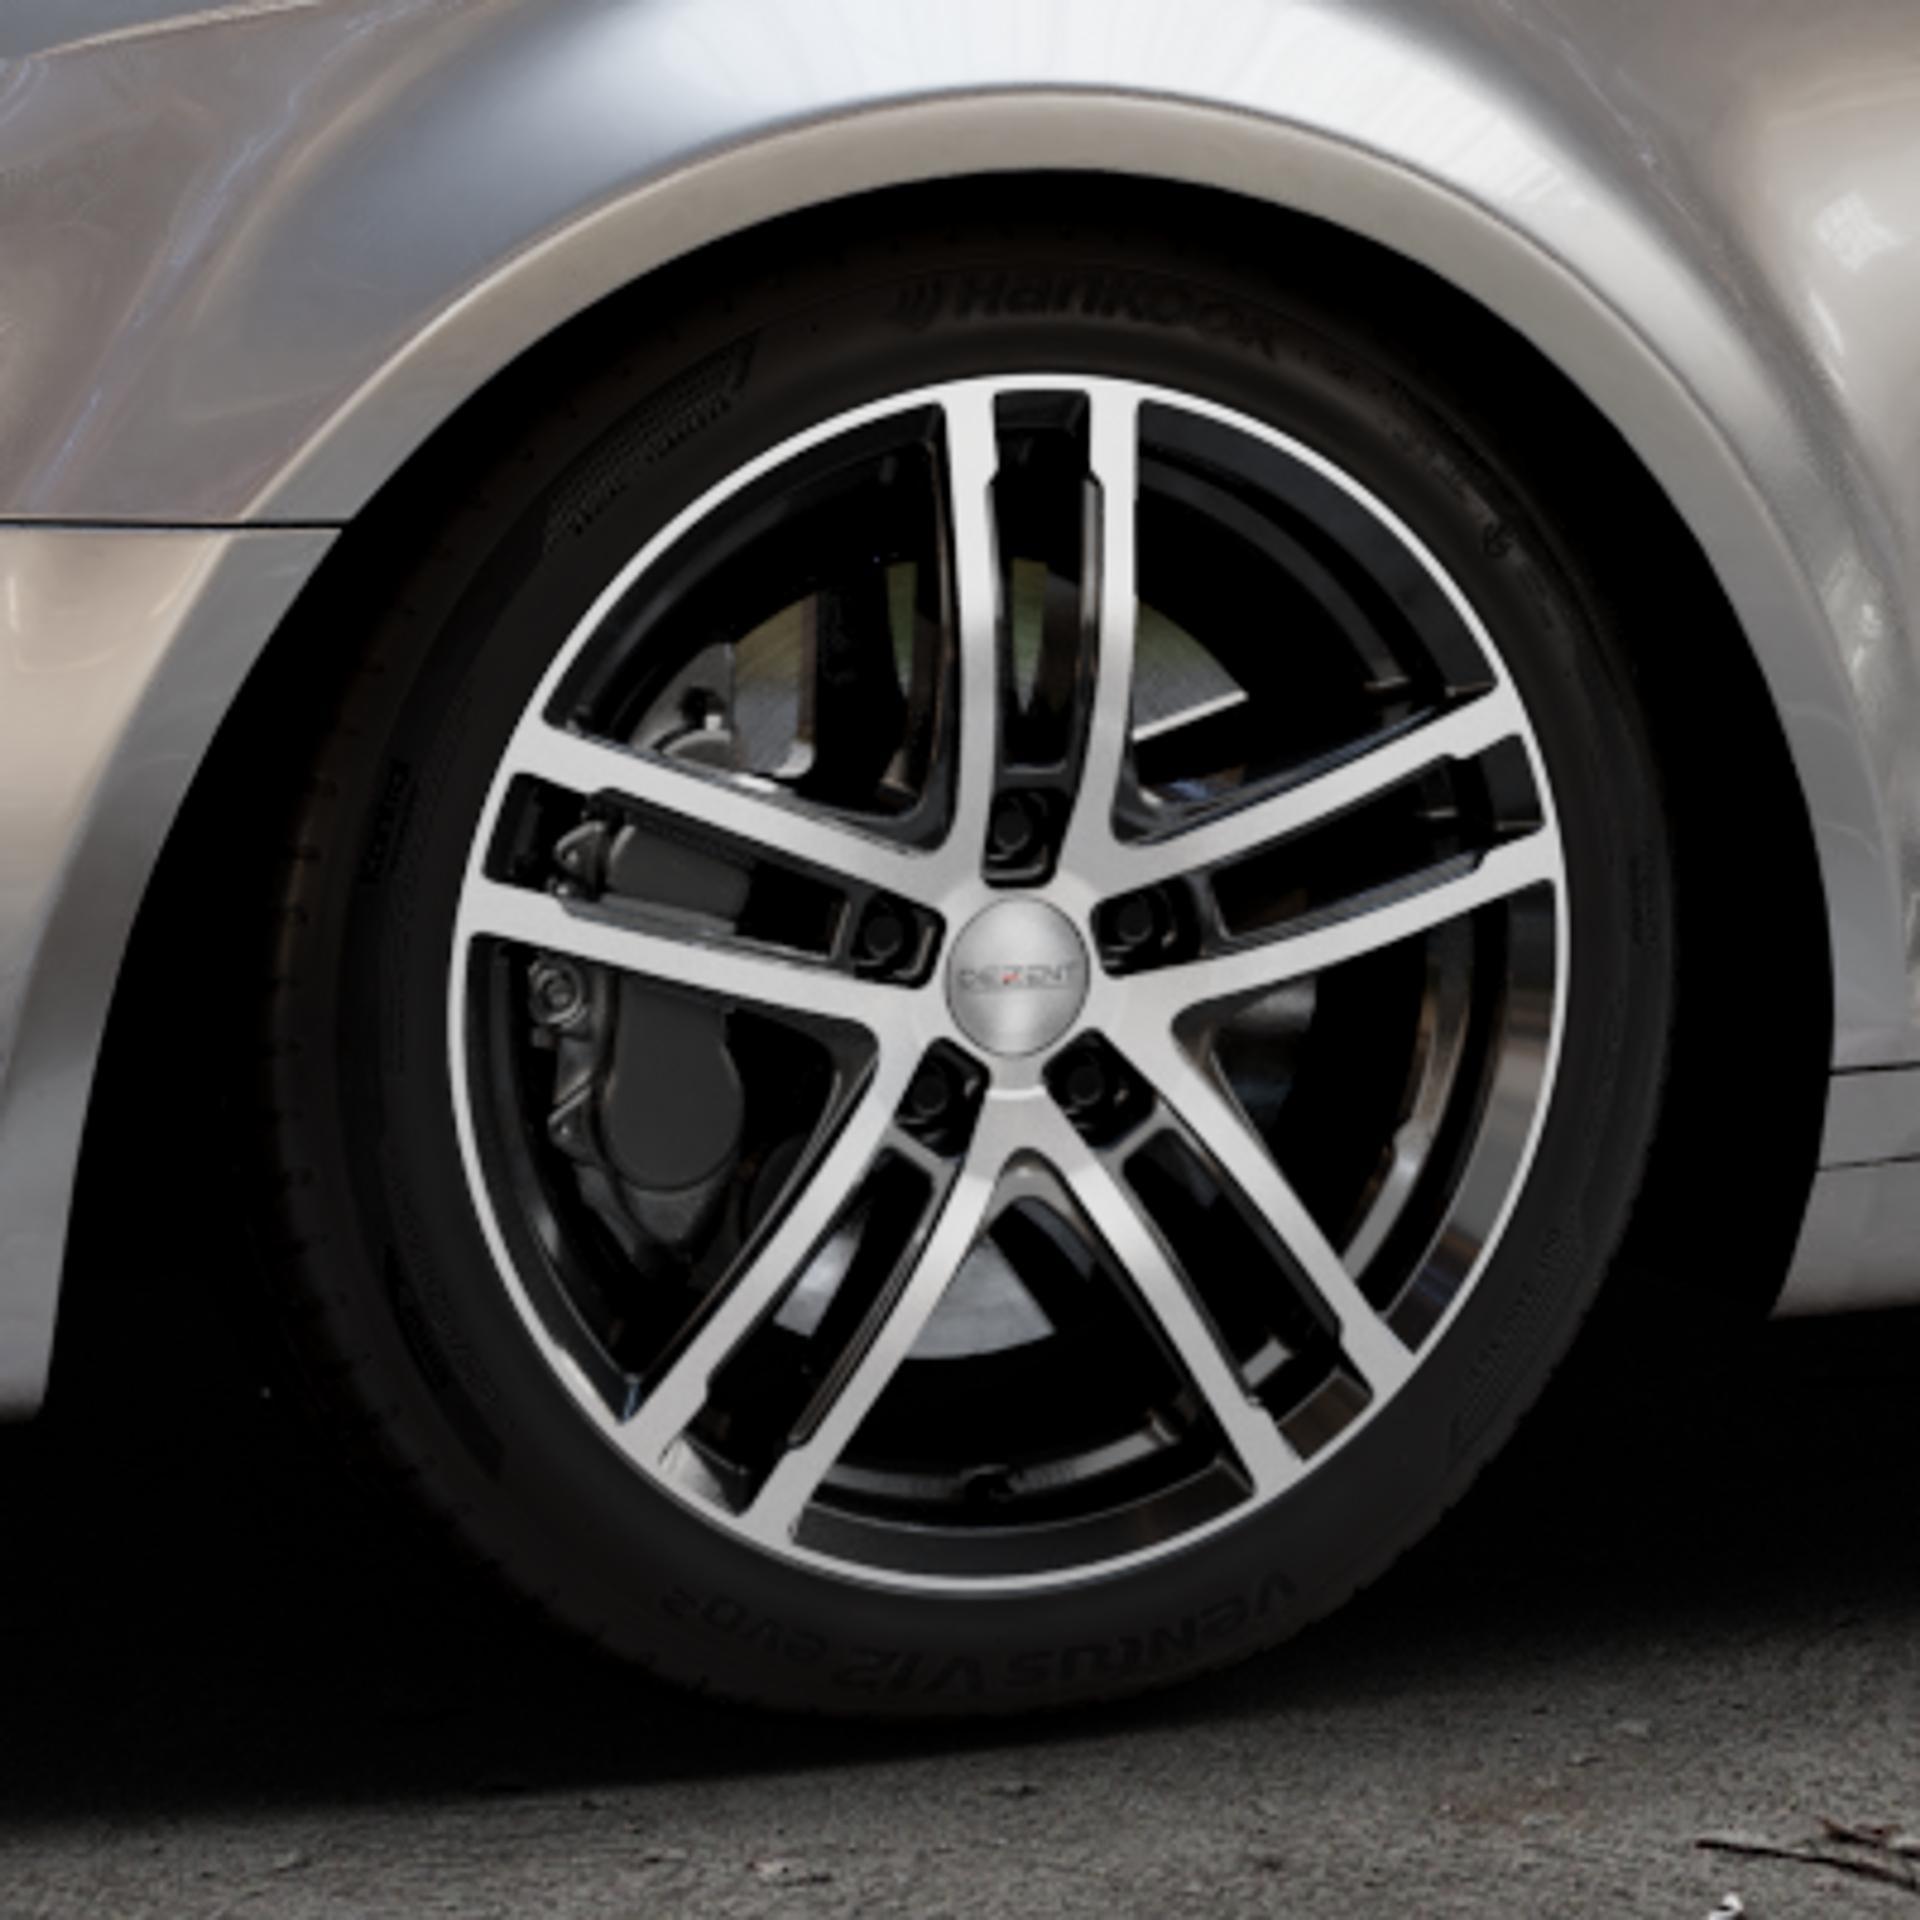 DEZENT TZ BLACK/POLISHED FRONT Felge mit Reifen silber schwarz mehrfarbig in 17Zoll Alufelge auf silbernem Audi A3 Typ 8P (Sportback) 1,6l 75kW (102 PS) 2,0l FSI 110kW (150 1,9l TDI 77kW (105 103kW (140 TFSI 147kW (200 85kW (116 100kW (136 1,8l 118kW (160 125kW (170 1,4l 92kW (125 120kW (163 quattro 3,2l V6 184kW (250 S3 195kW (265 1,2l 66kW (90